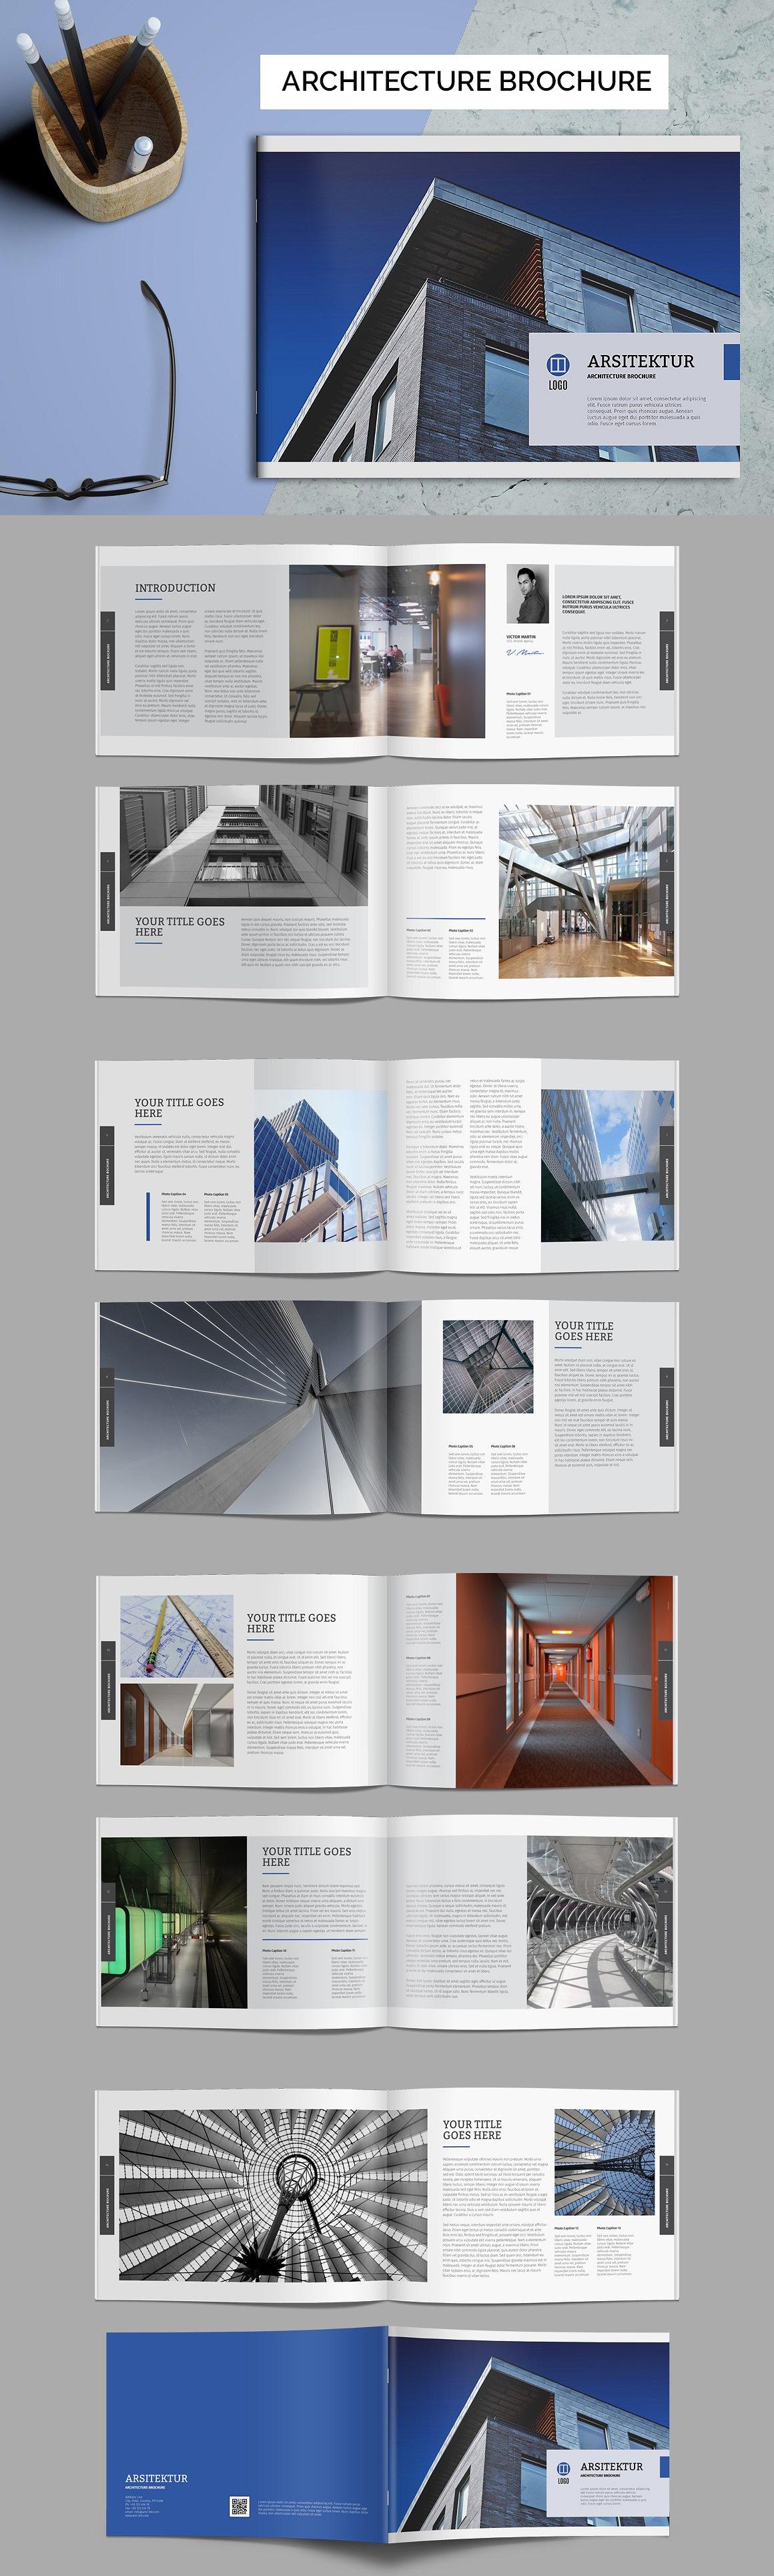 Architecture Brochure Template Pdf Indd Brochure Design Templates